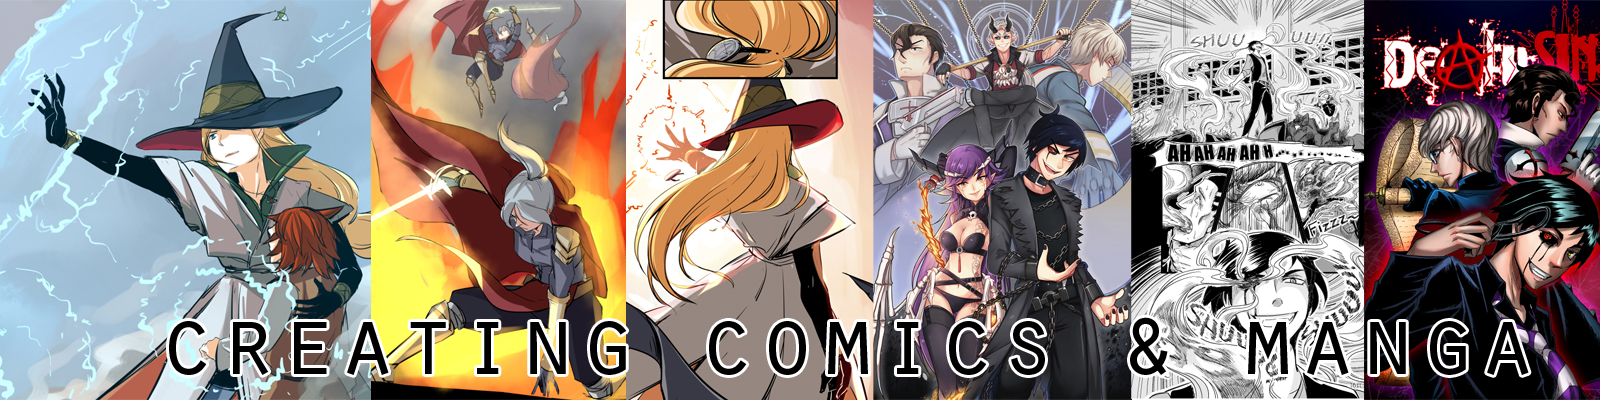 Fallen Manga Studios is creating Webtoons   Patreon